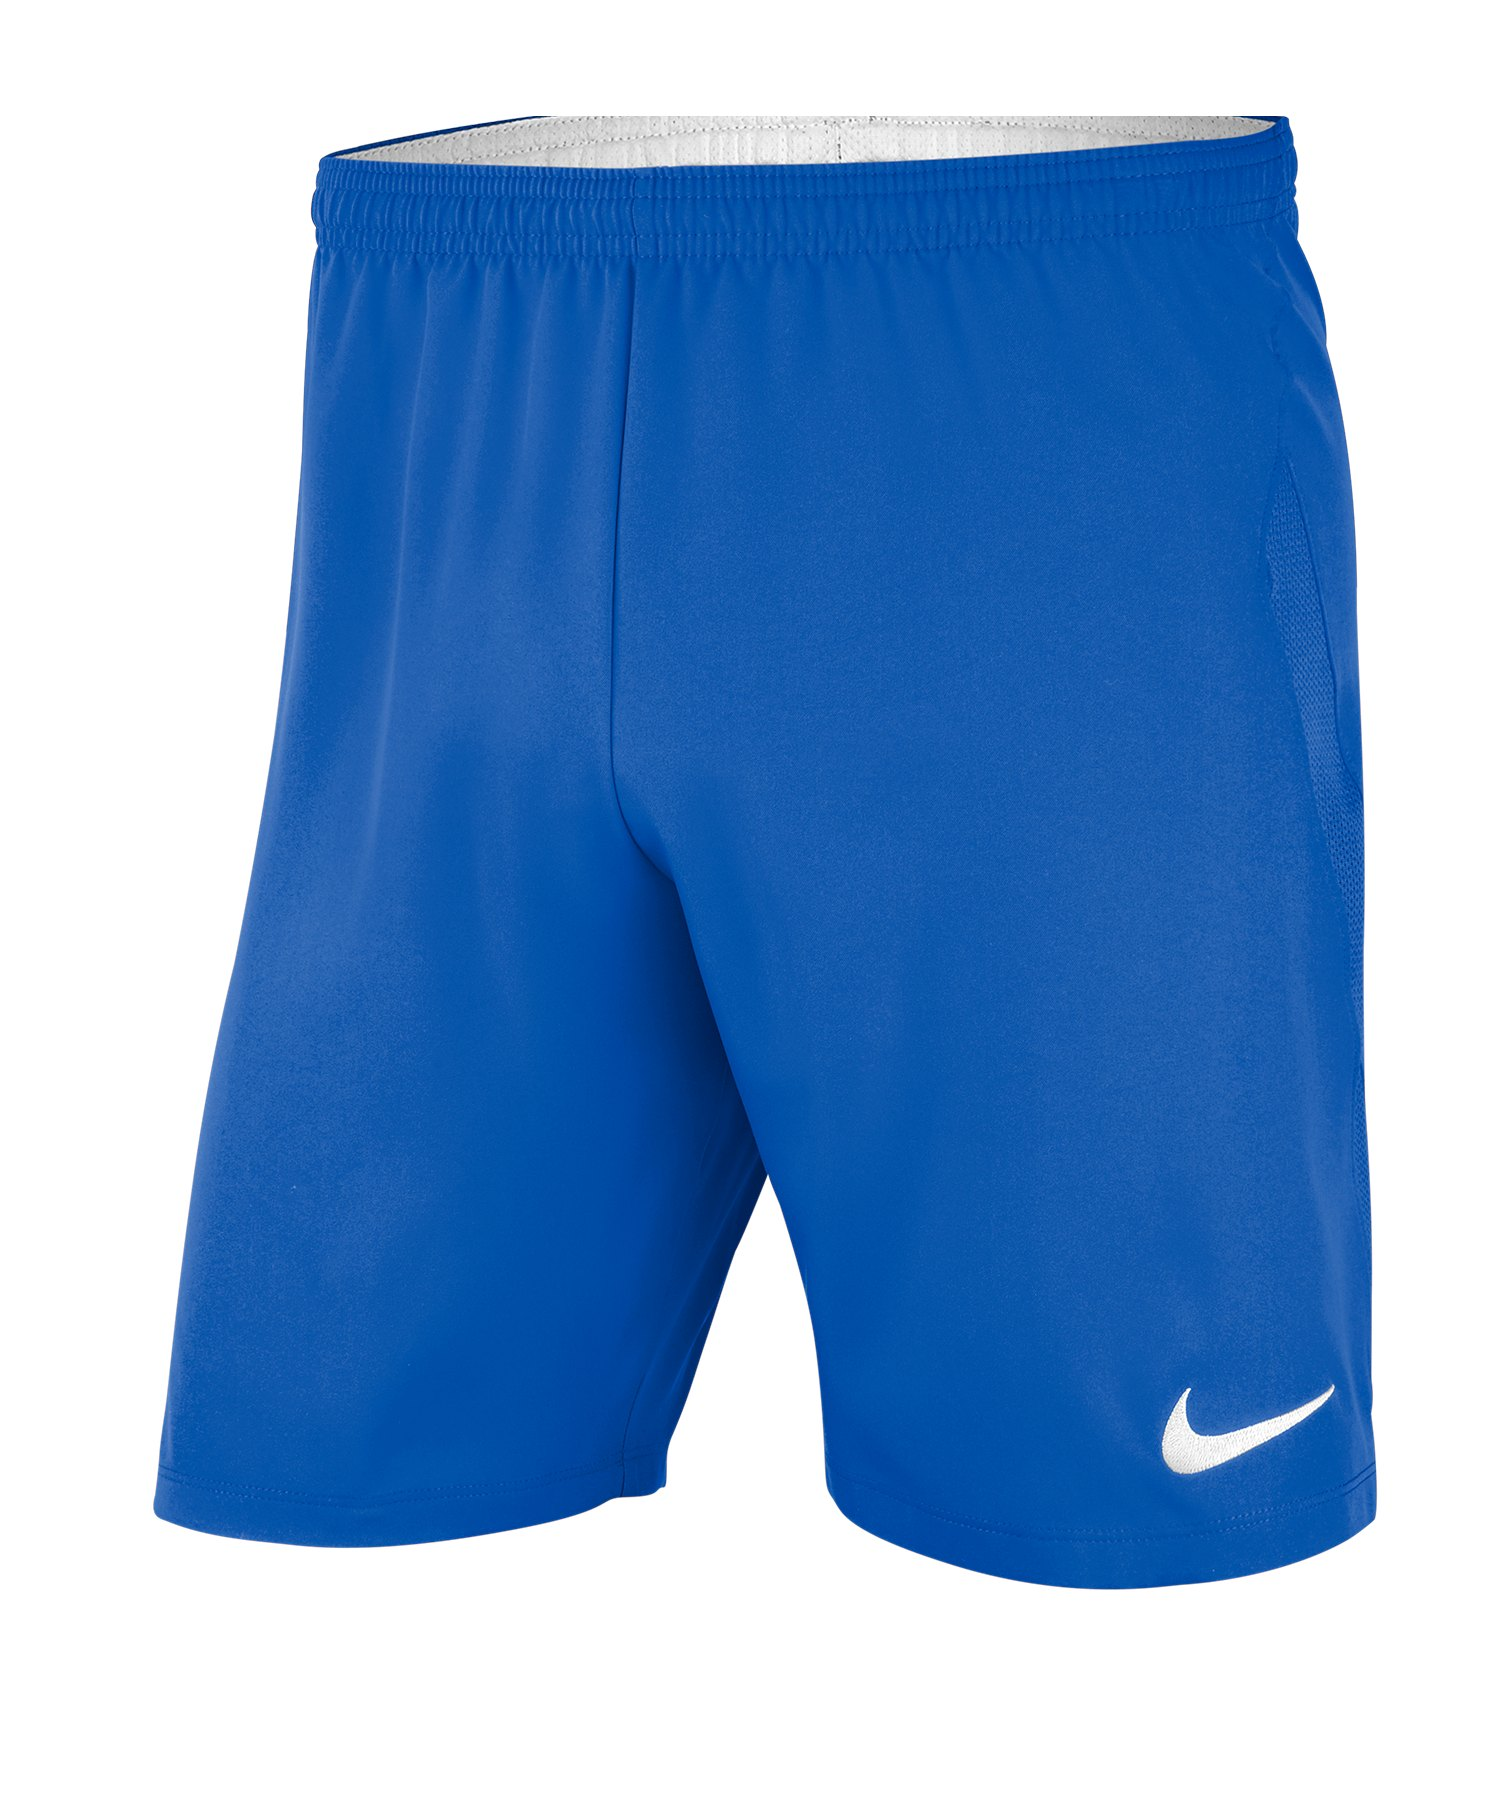 Nike Laser IV Dri-FIT Short Kids Blau F463 - blau